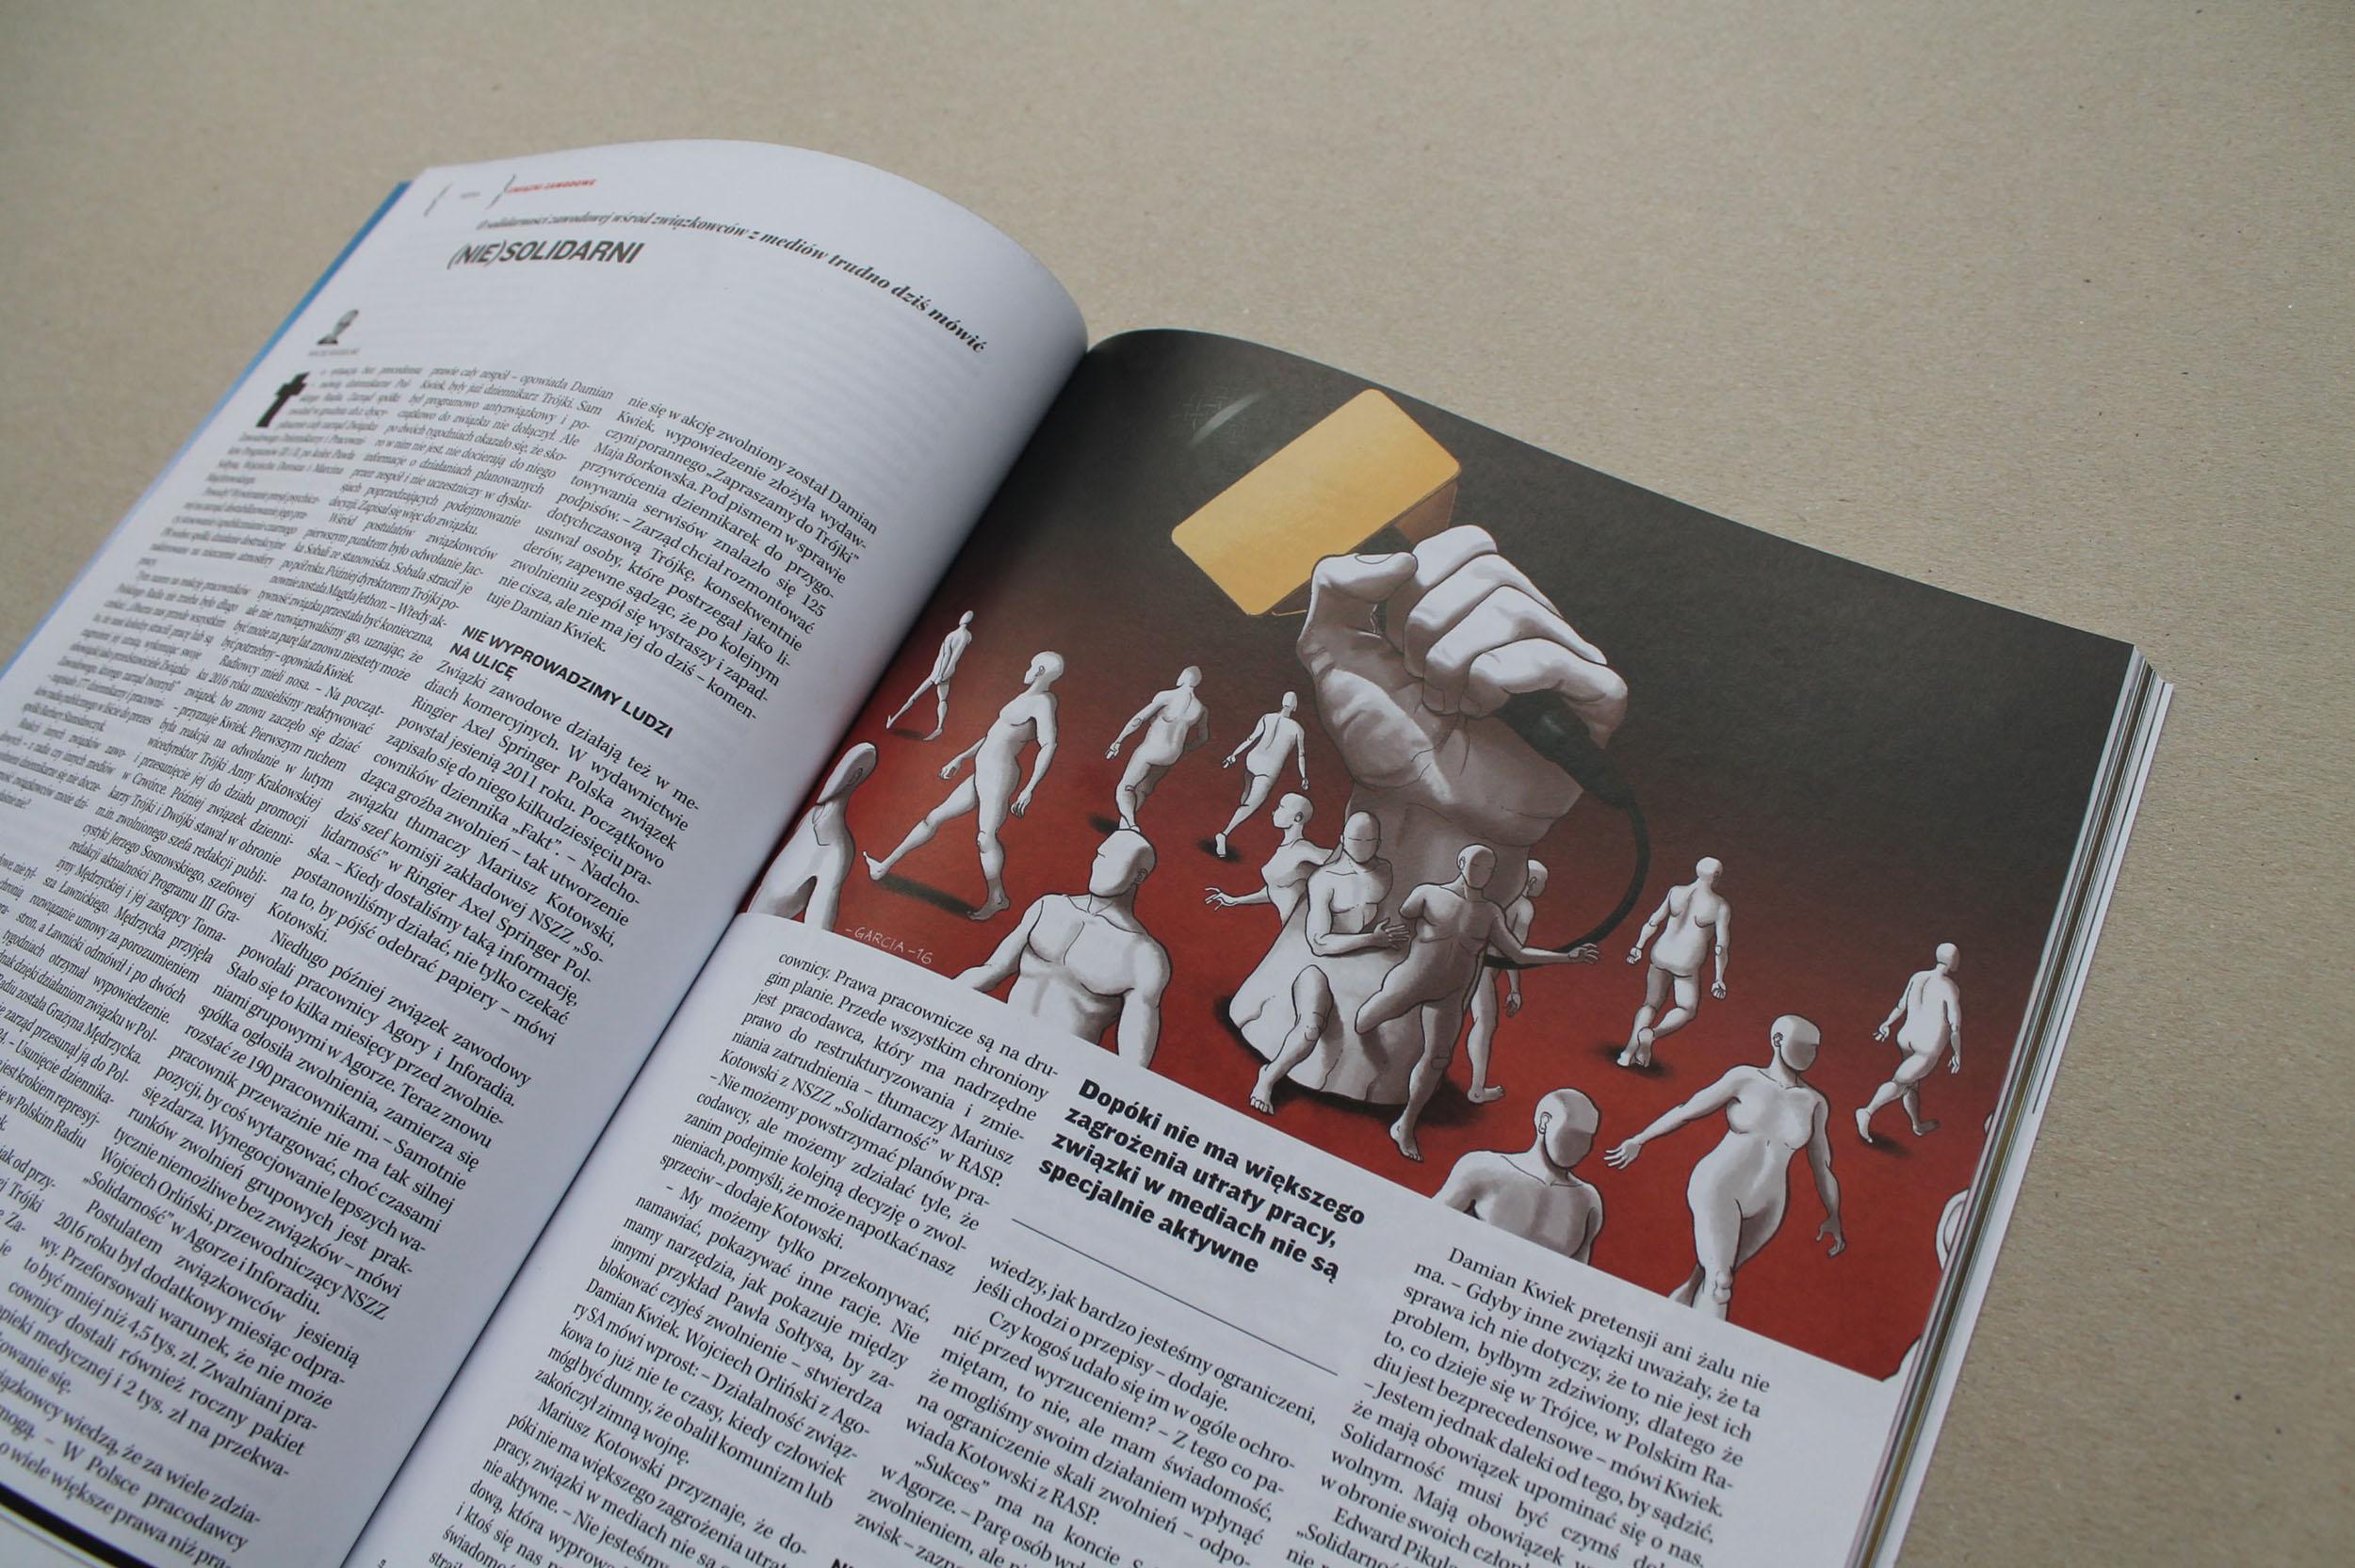 daniel-garcia-art-illustration-press-journalists-unions-hand-people-polska-dziennikarze-2